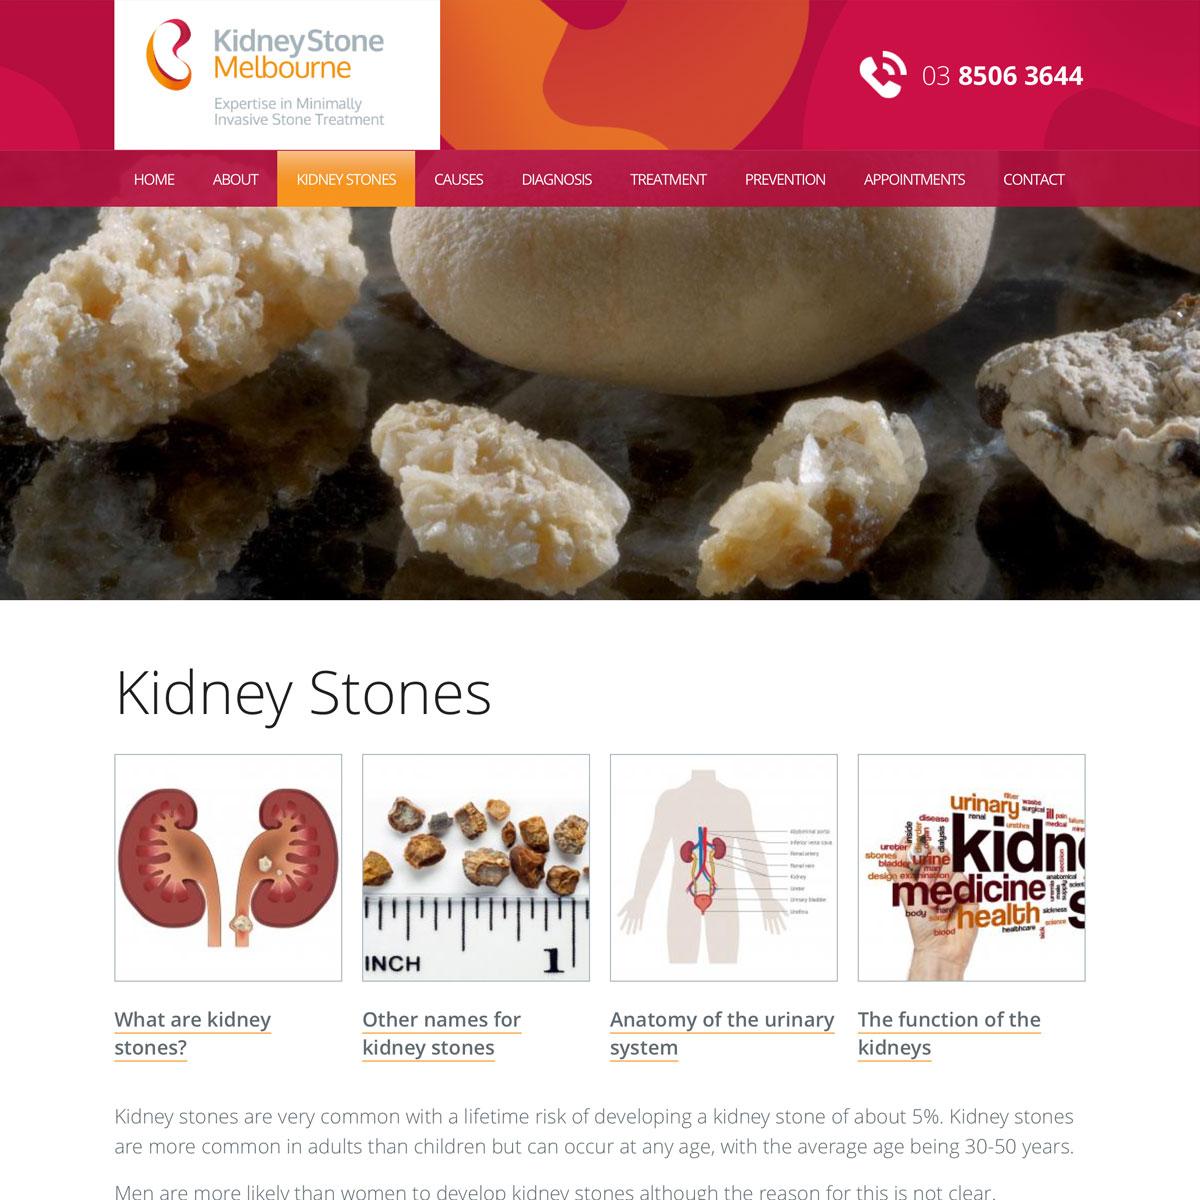 Kidney Stone Melbourne - Kidney Stones